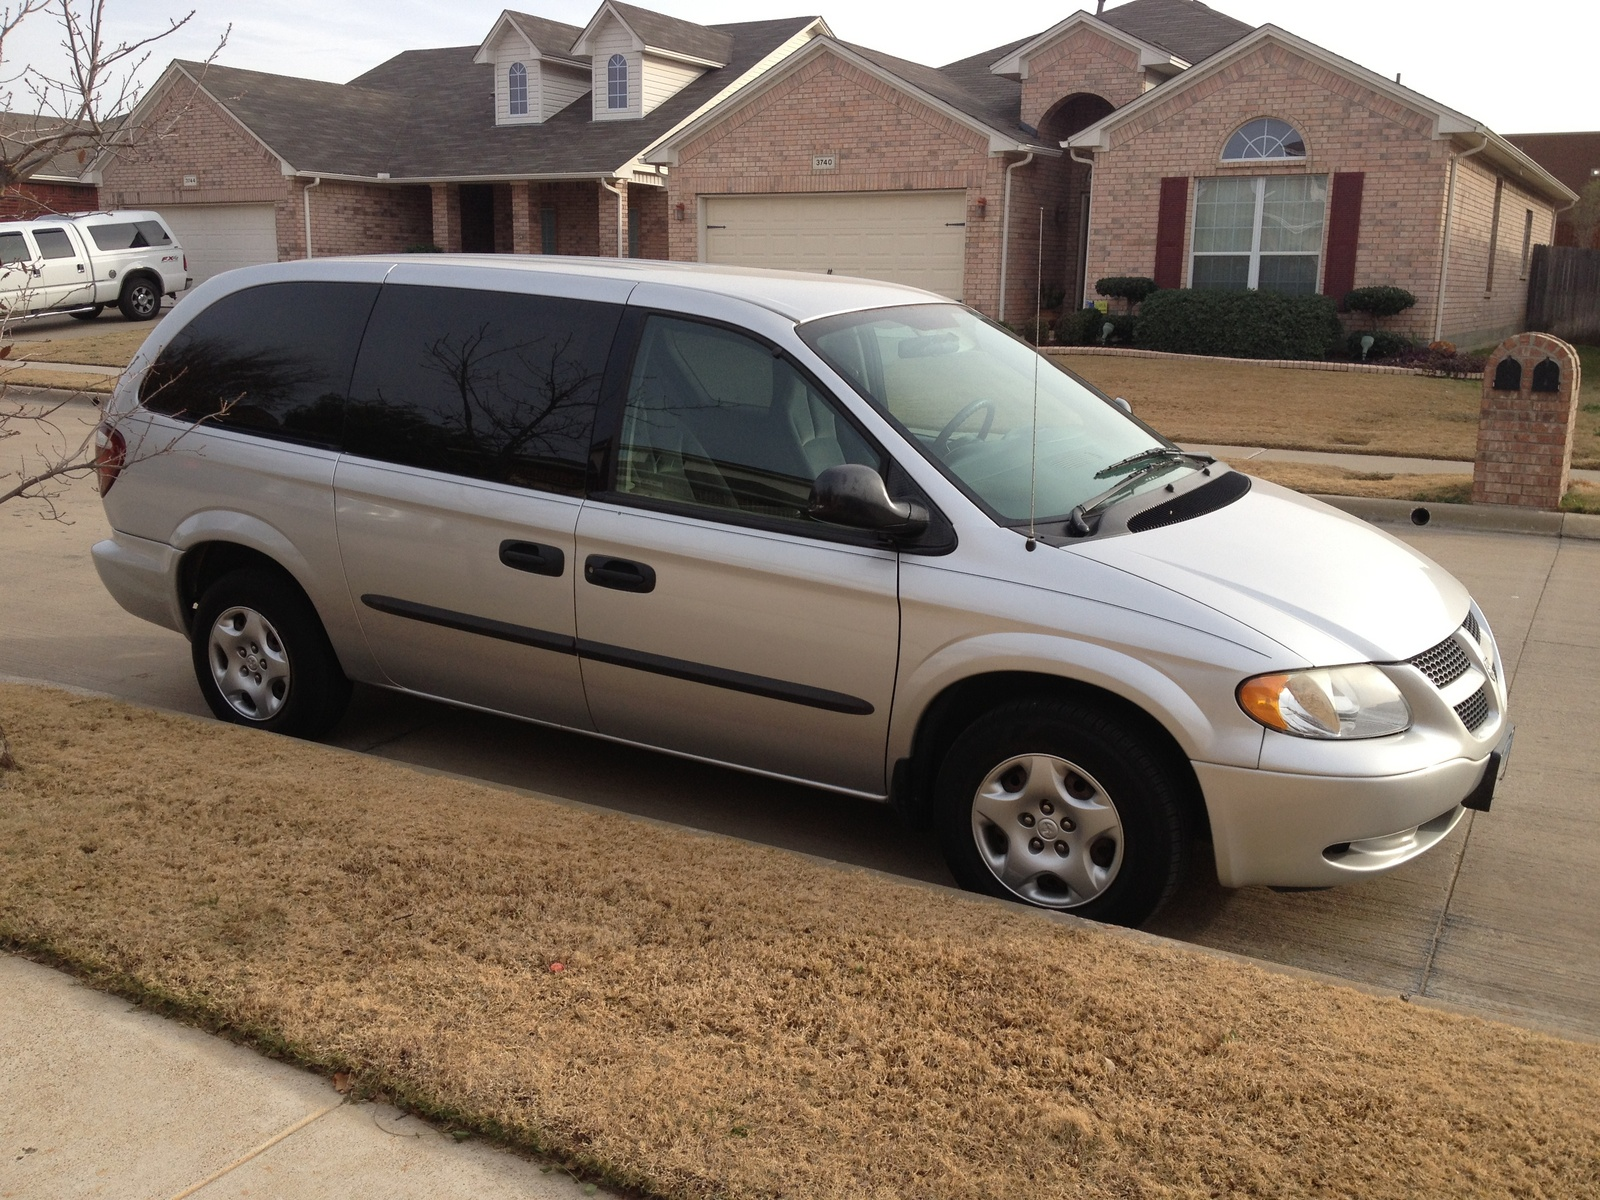 picture of 2003 dodge grand caravan 4 dr es passenger van extended. Cars Review. Best American Auto & Cars Review